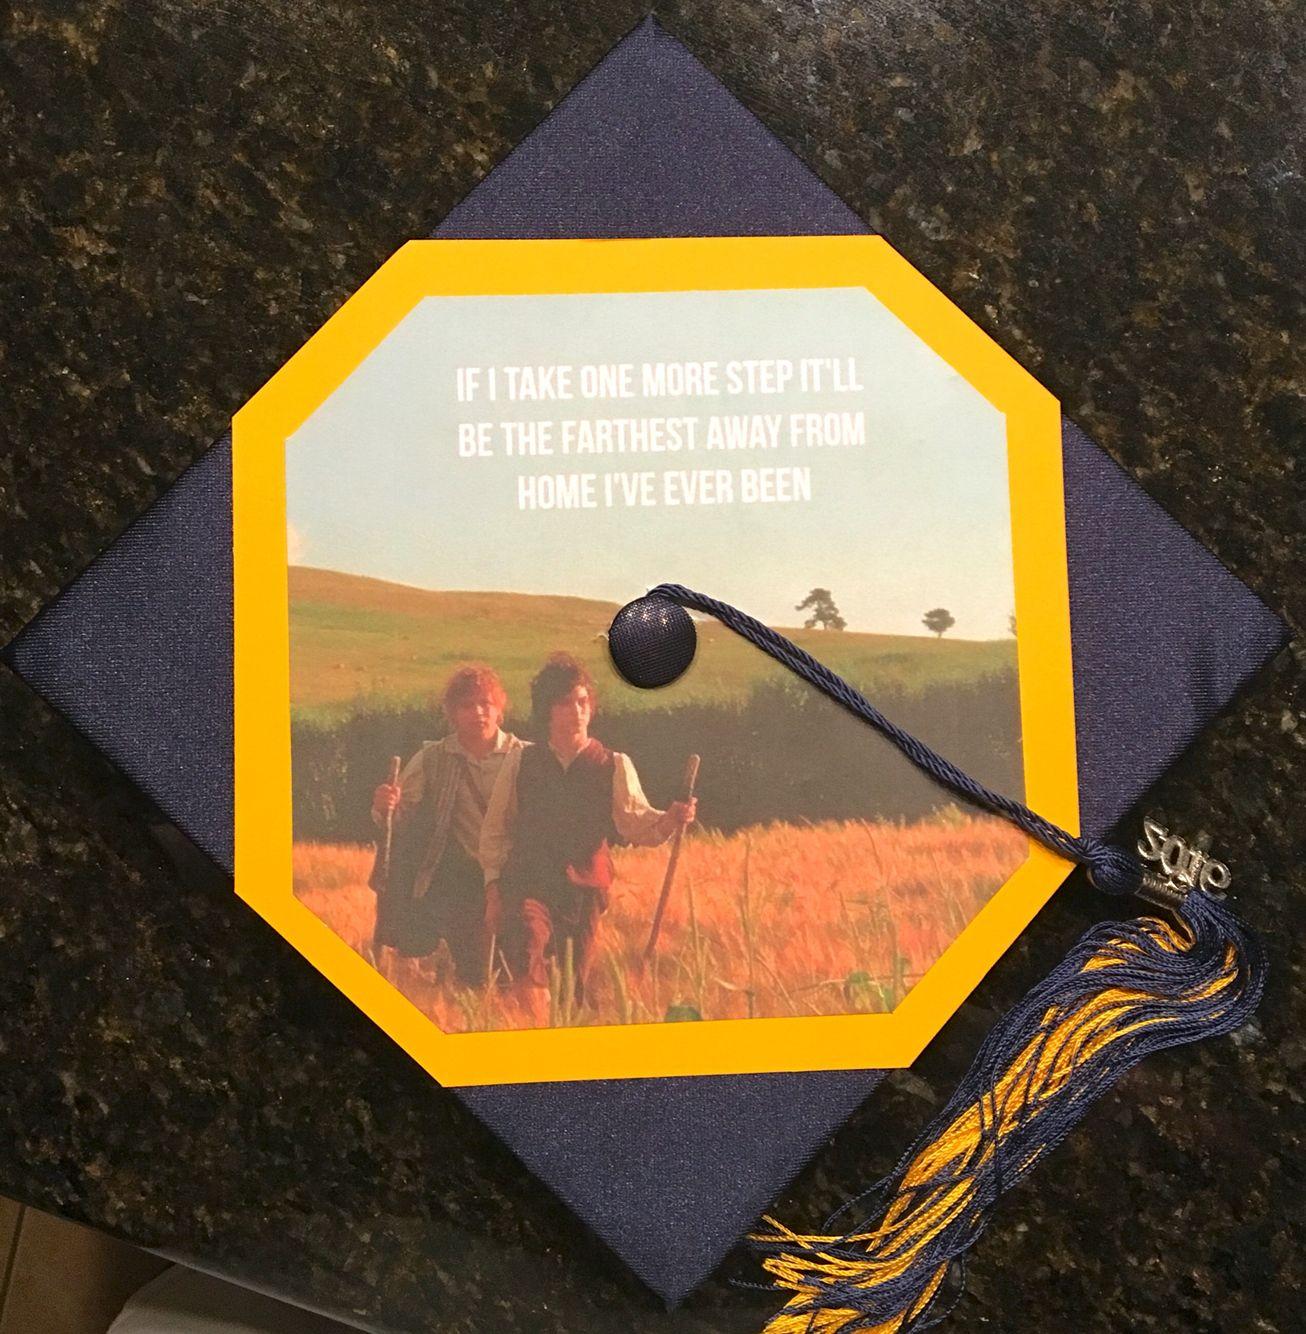 Lord Of The Rings Graduation Cap Graduation Party Planning Graduation Diy Diy Graduation Cap